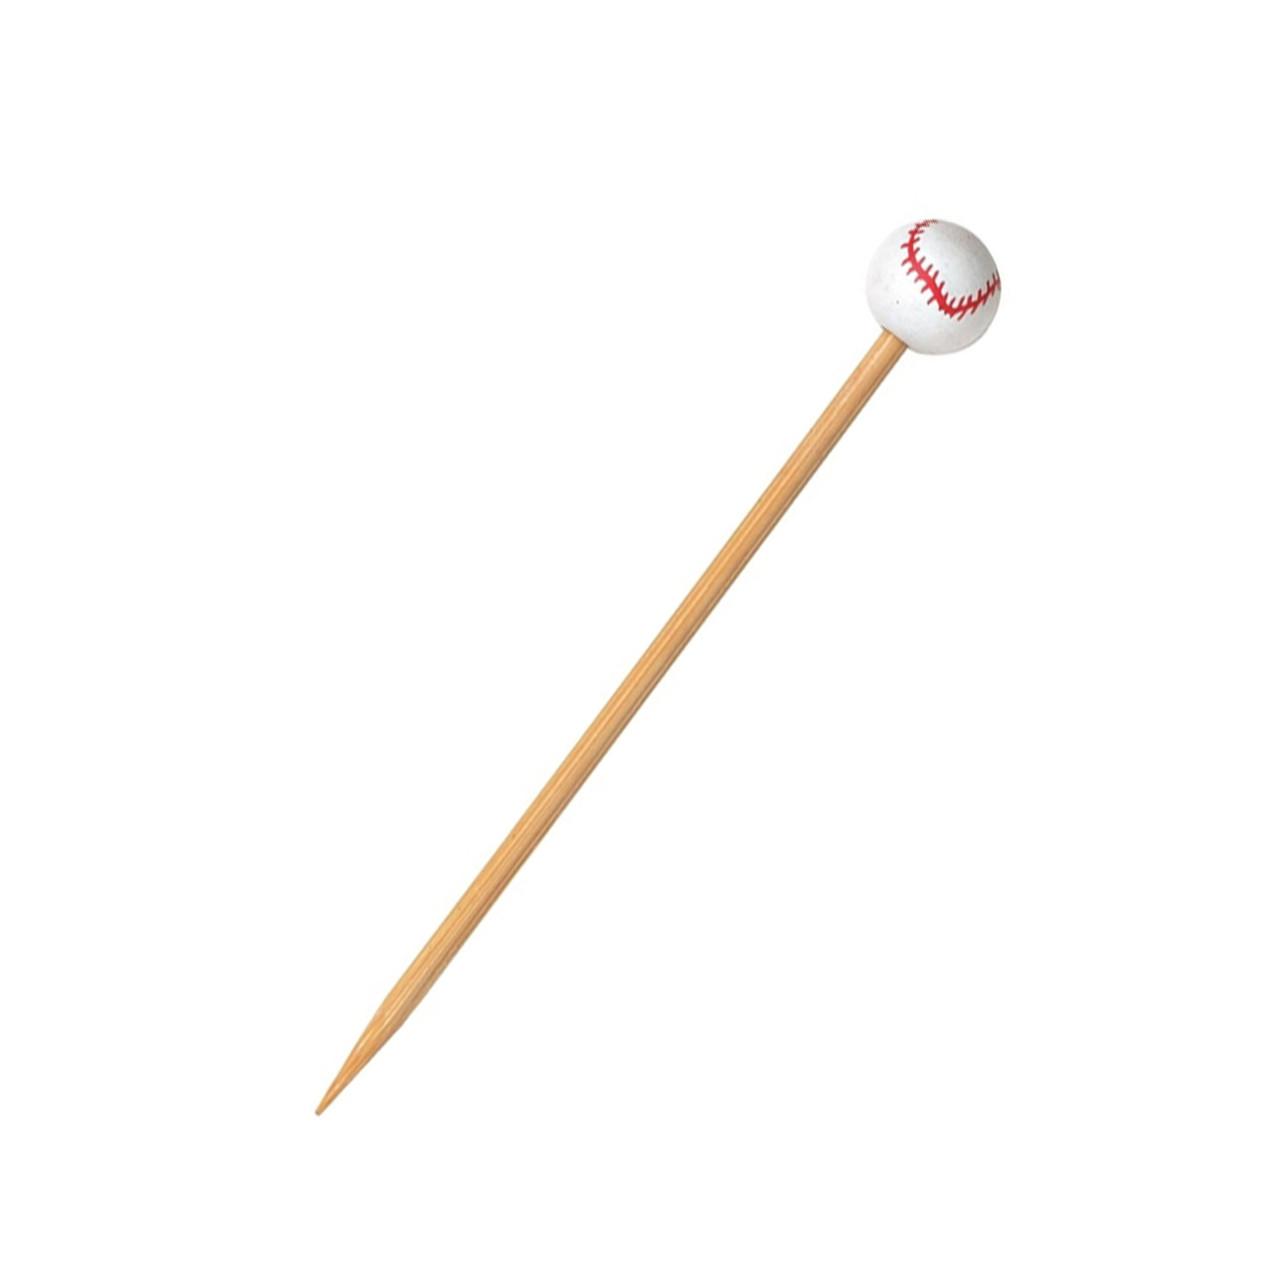 Bamboo Baseball Skewers - L:4.8in